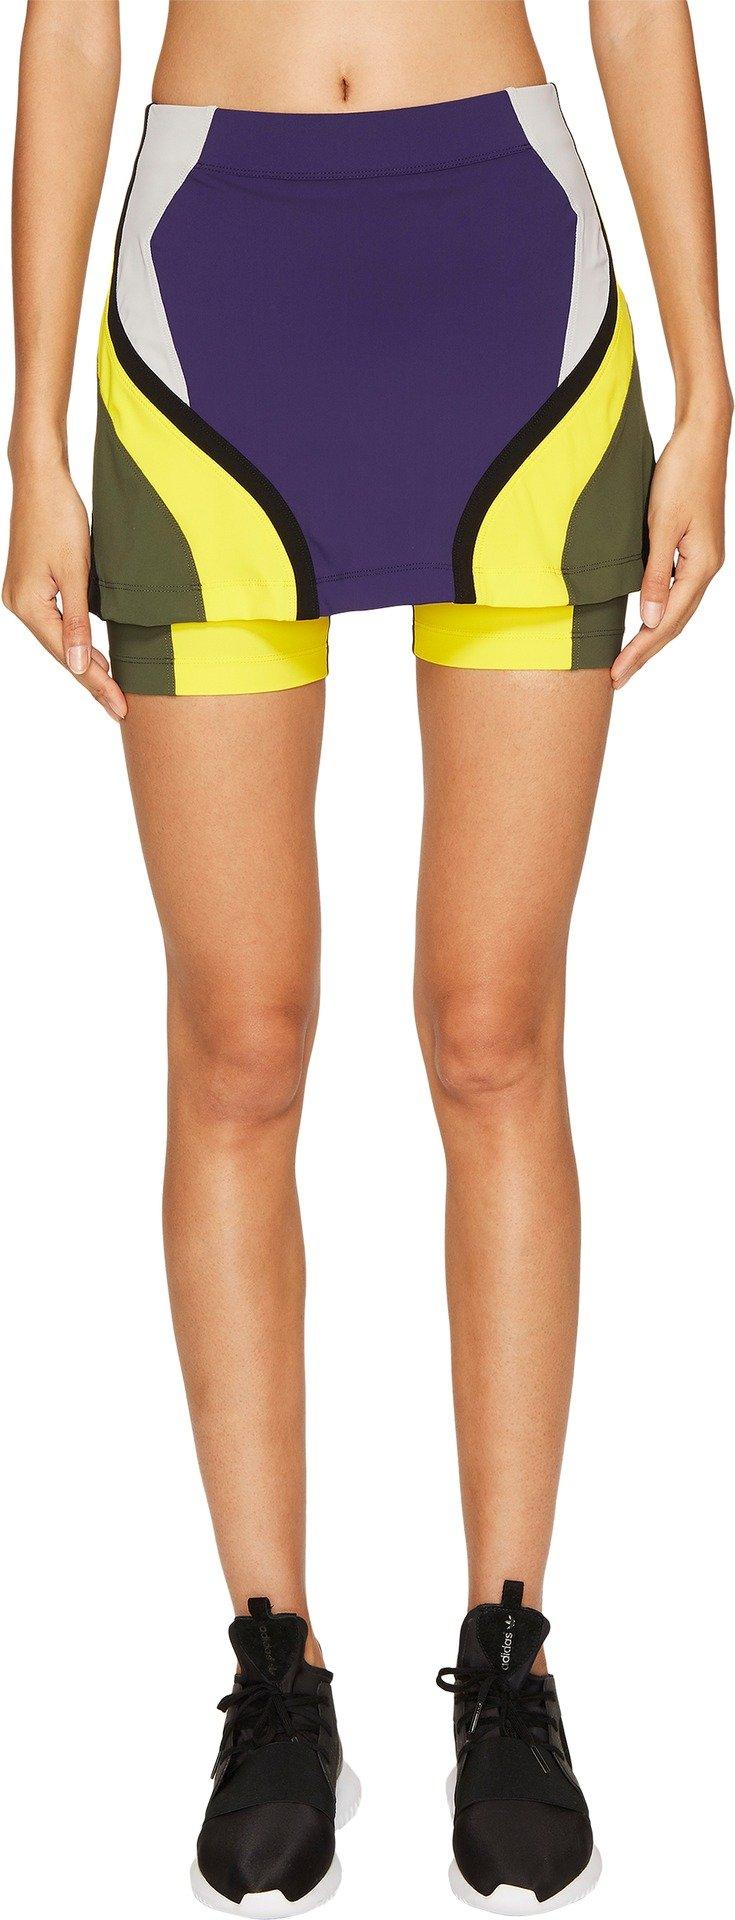 No KA'OI Women's Kelani Skirt Yellow/Pearl/Purple/Olive/Black 1